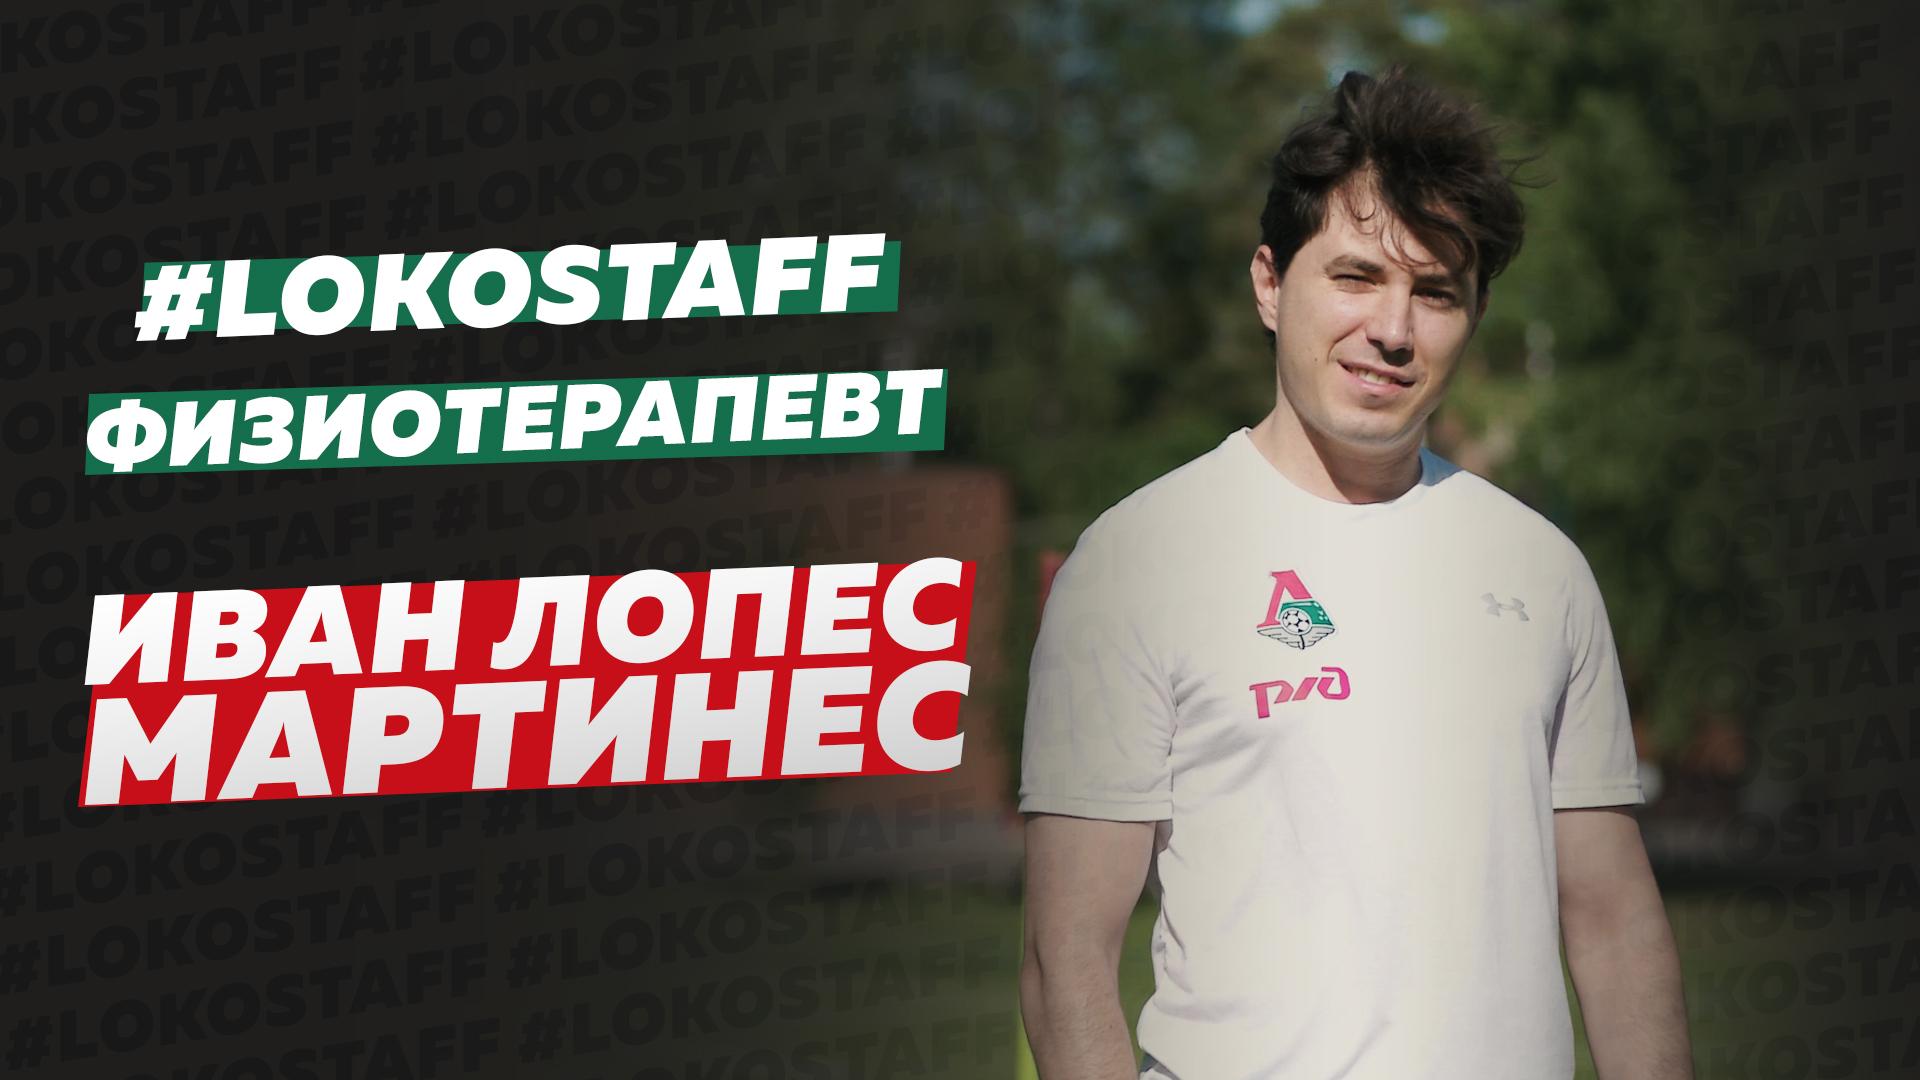 LokoStaff // Физиотерапевт «Локо»  Иван